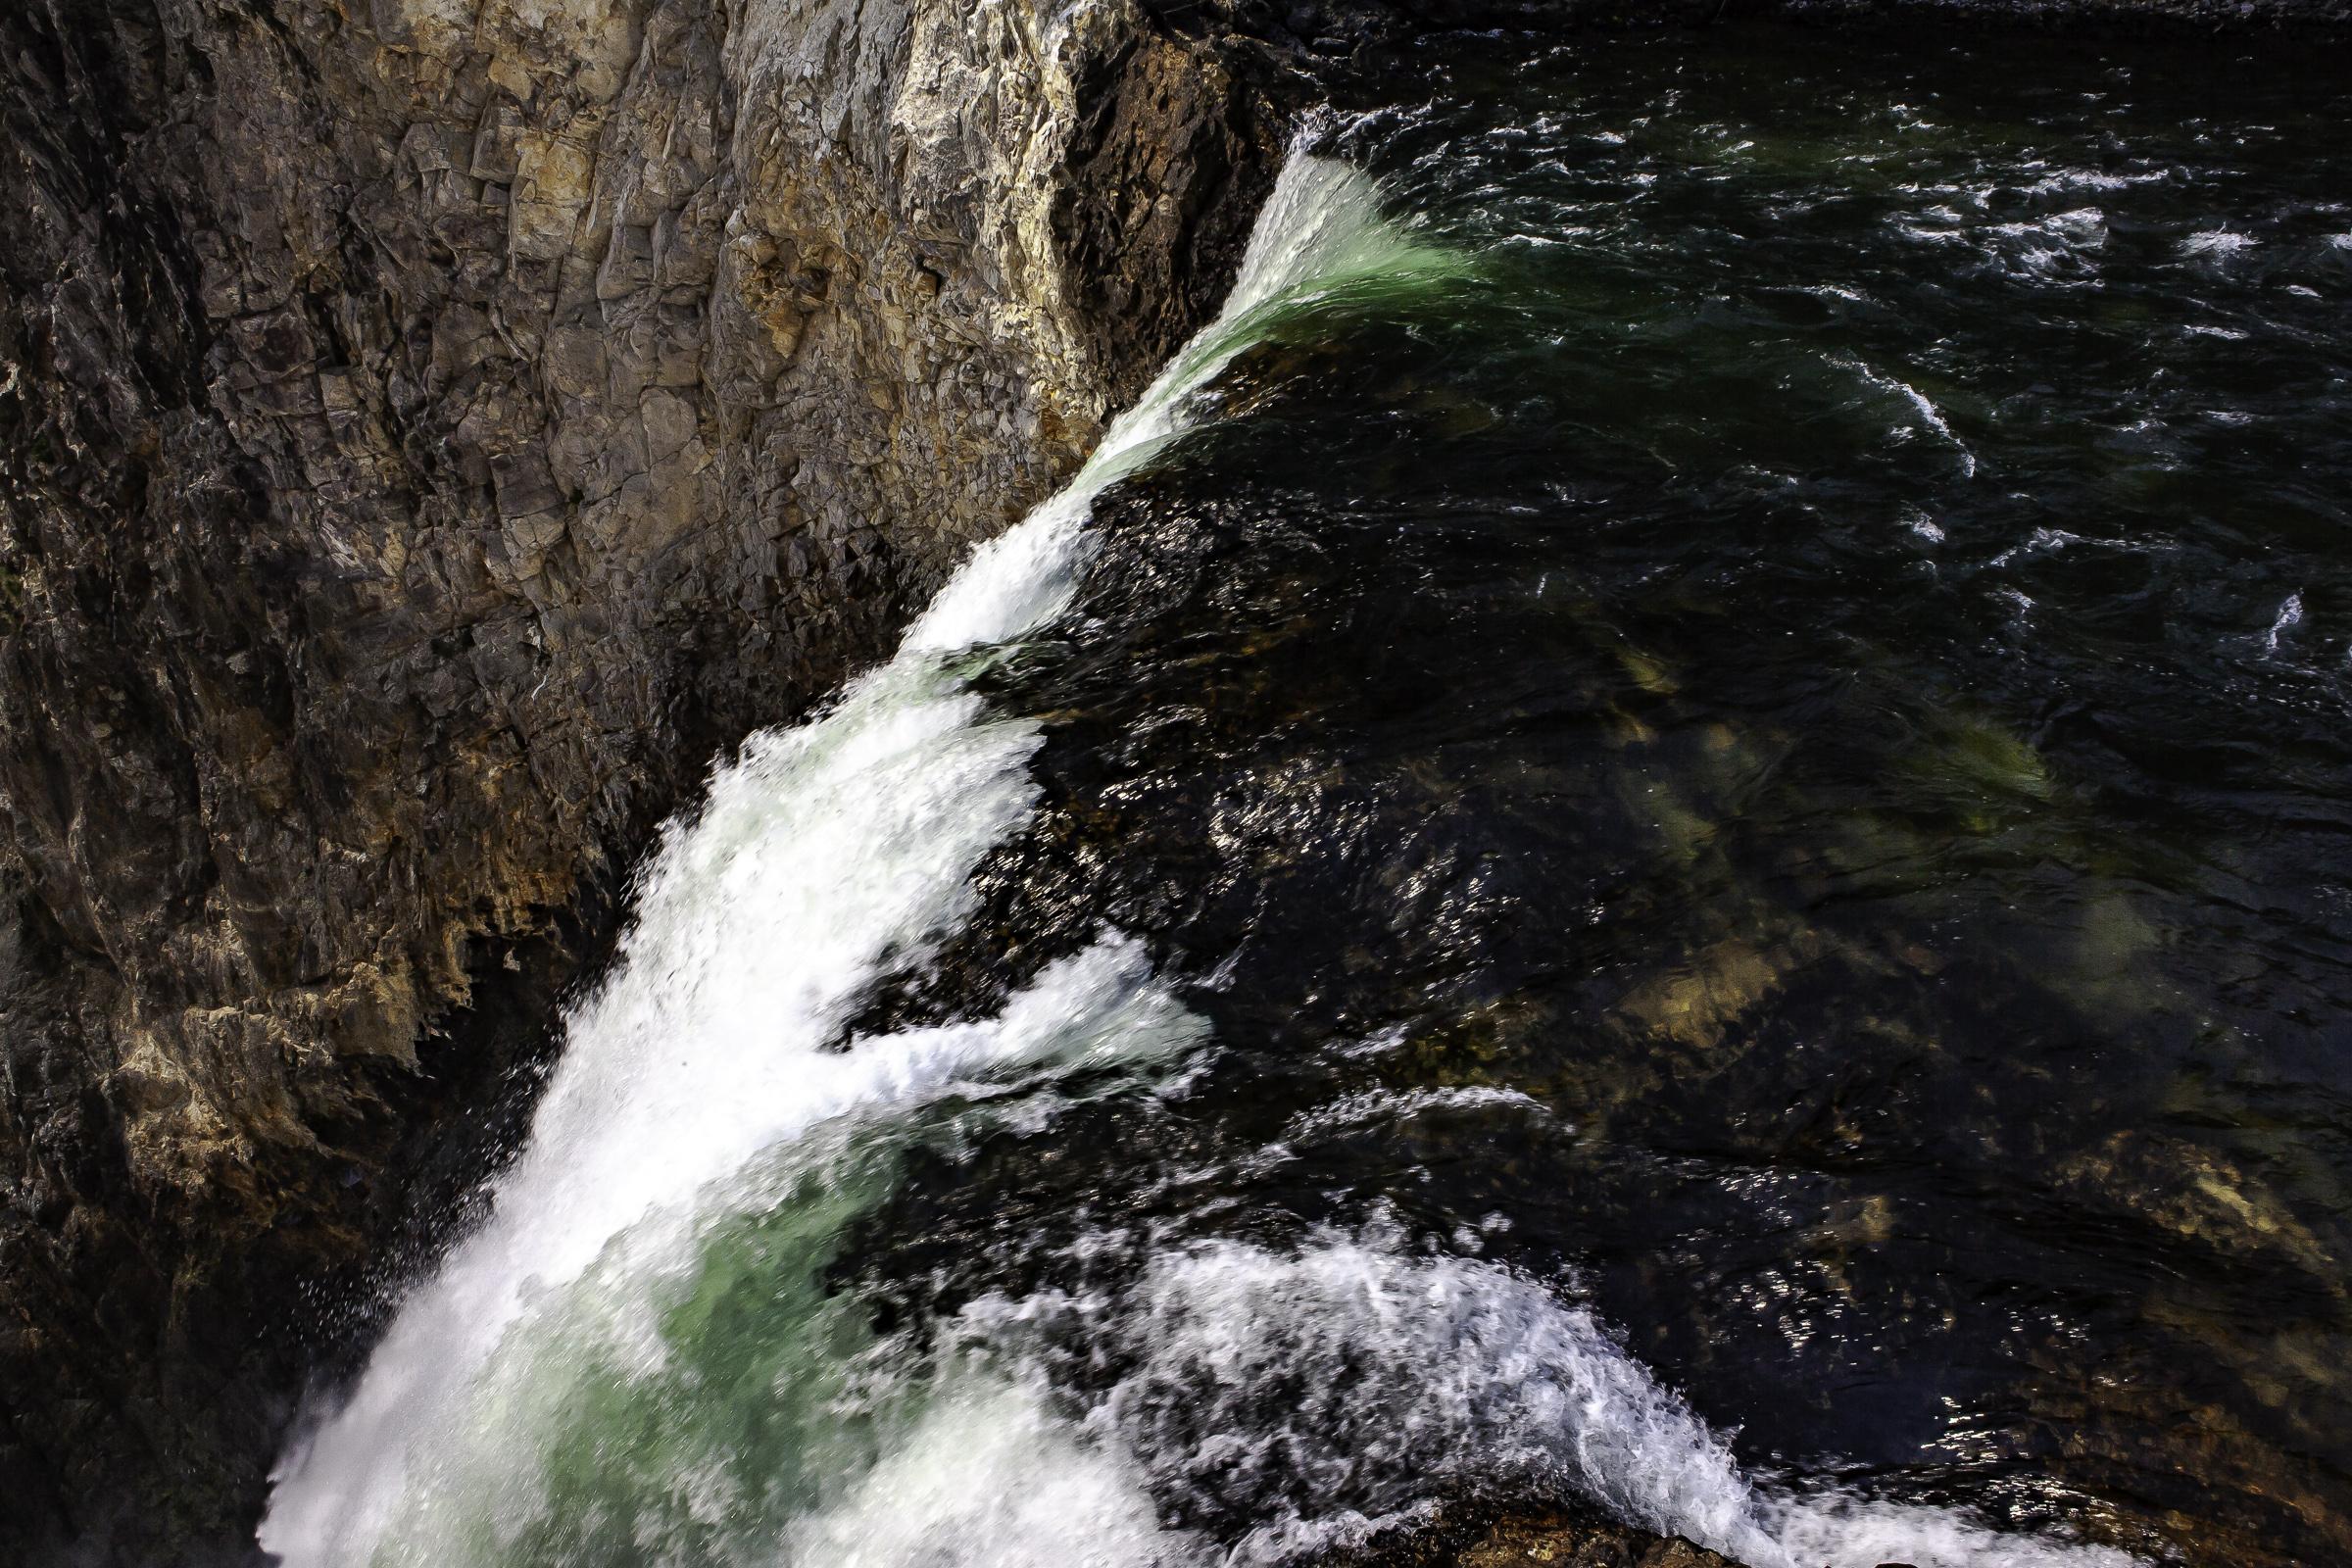 River Falling